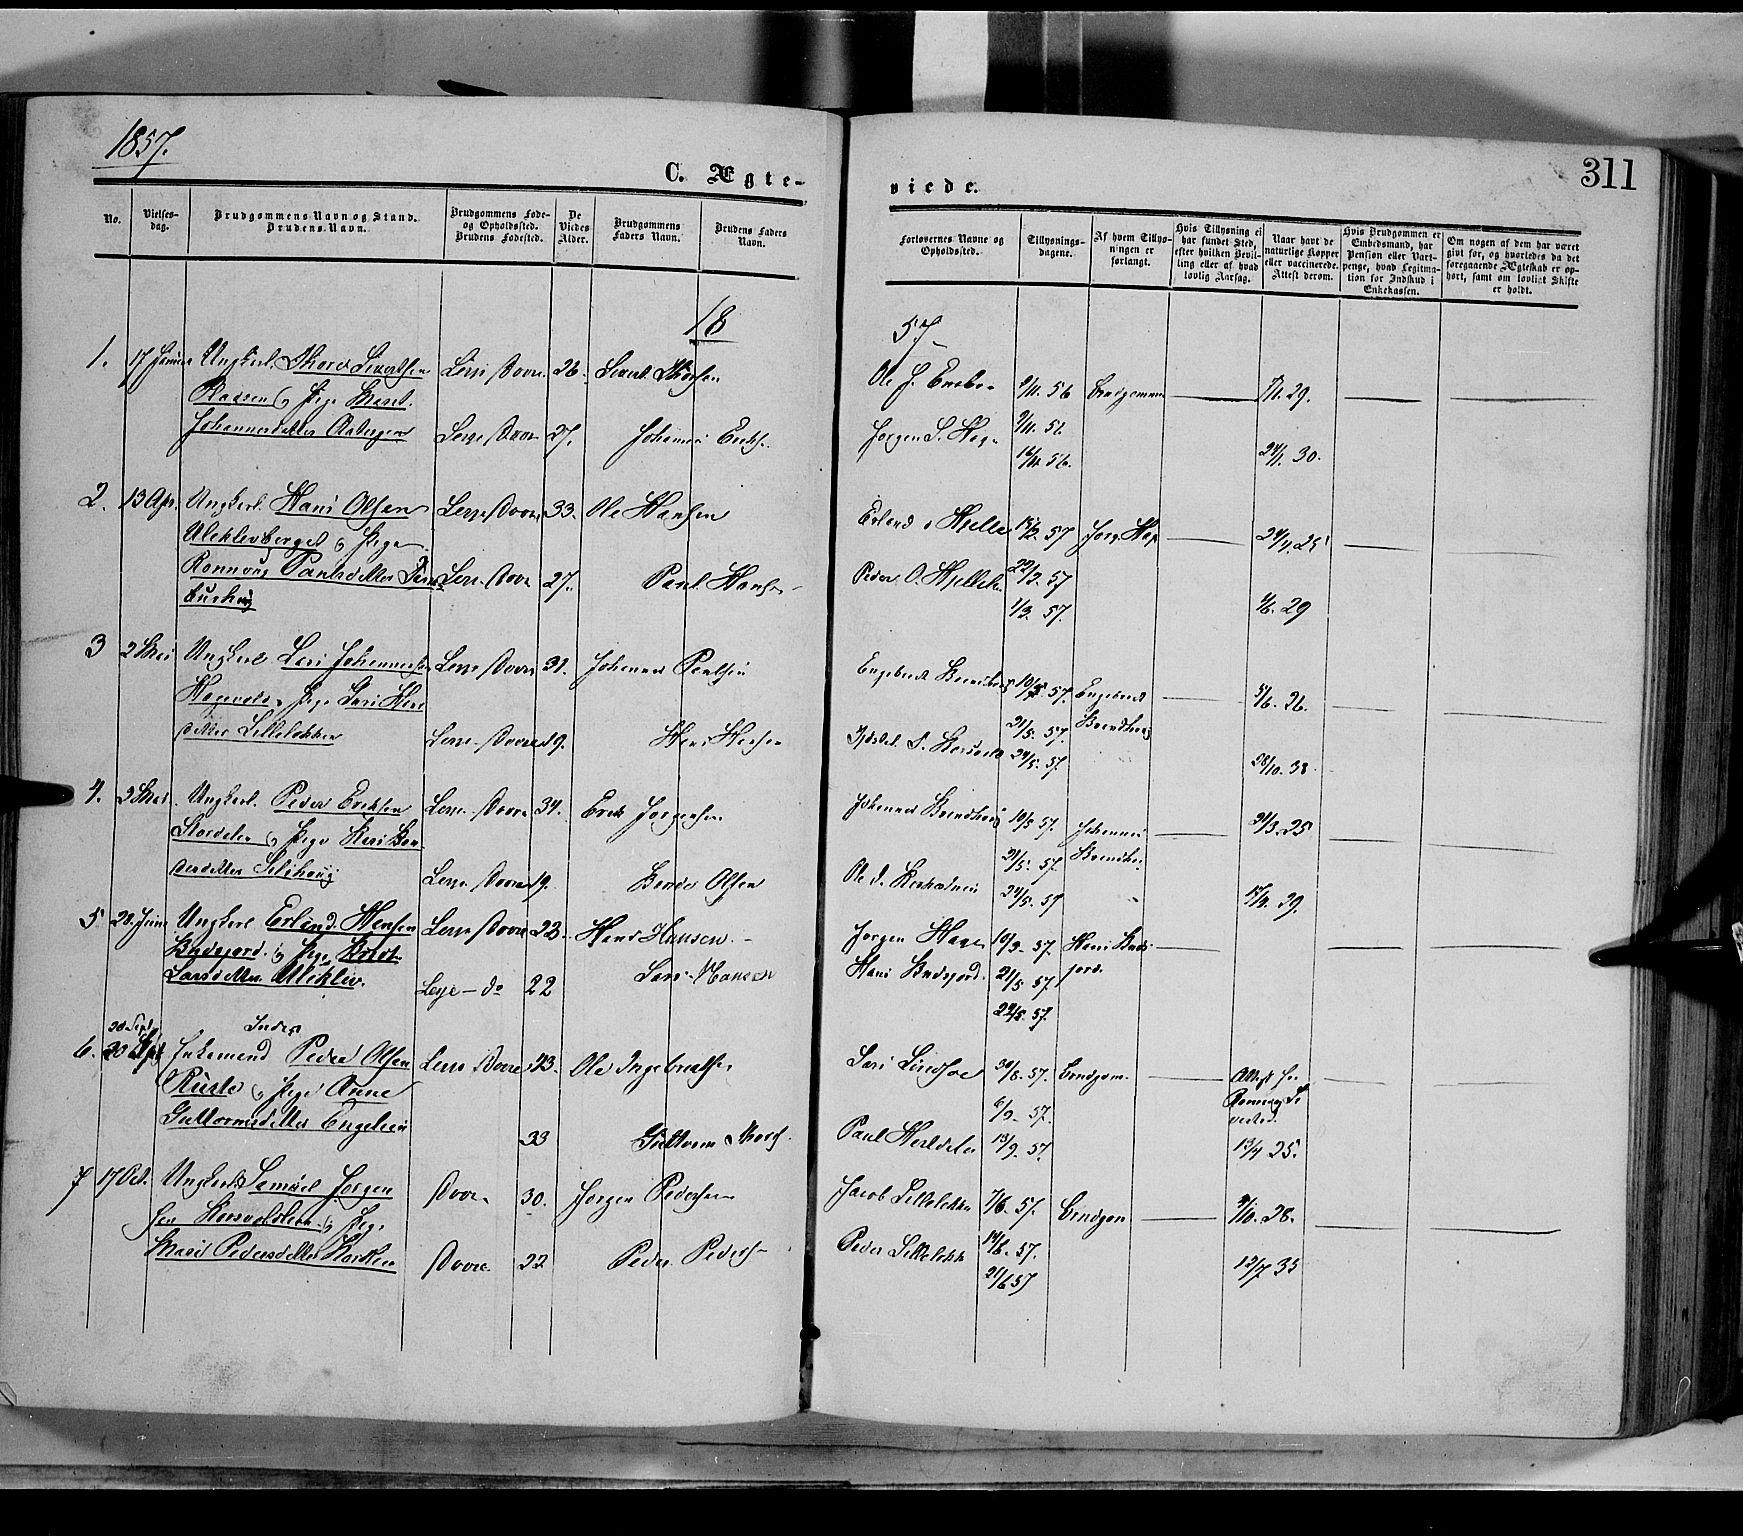 SAH, Dovre prestekontor, Parish register (official) no. 1, 1854-1878, p. 311